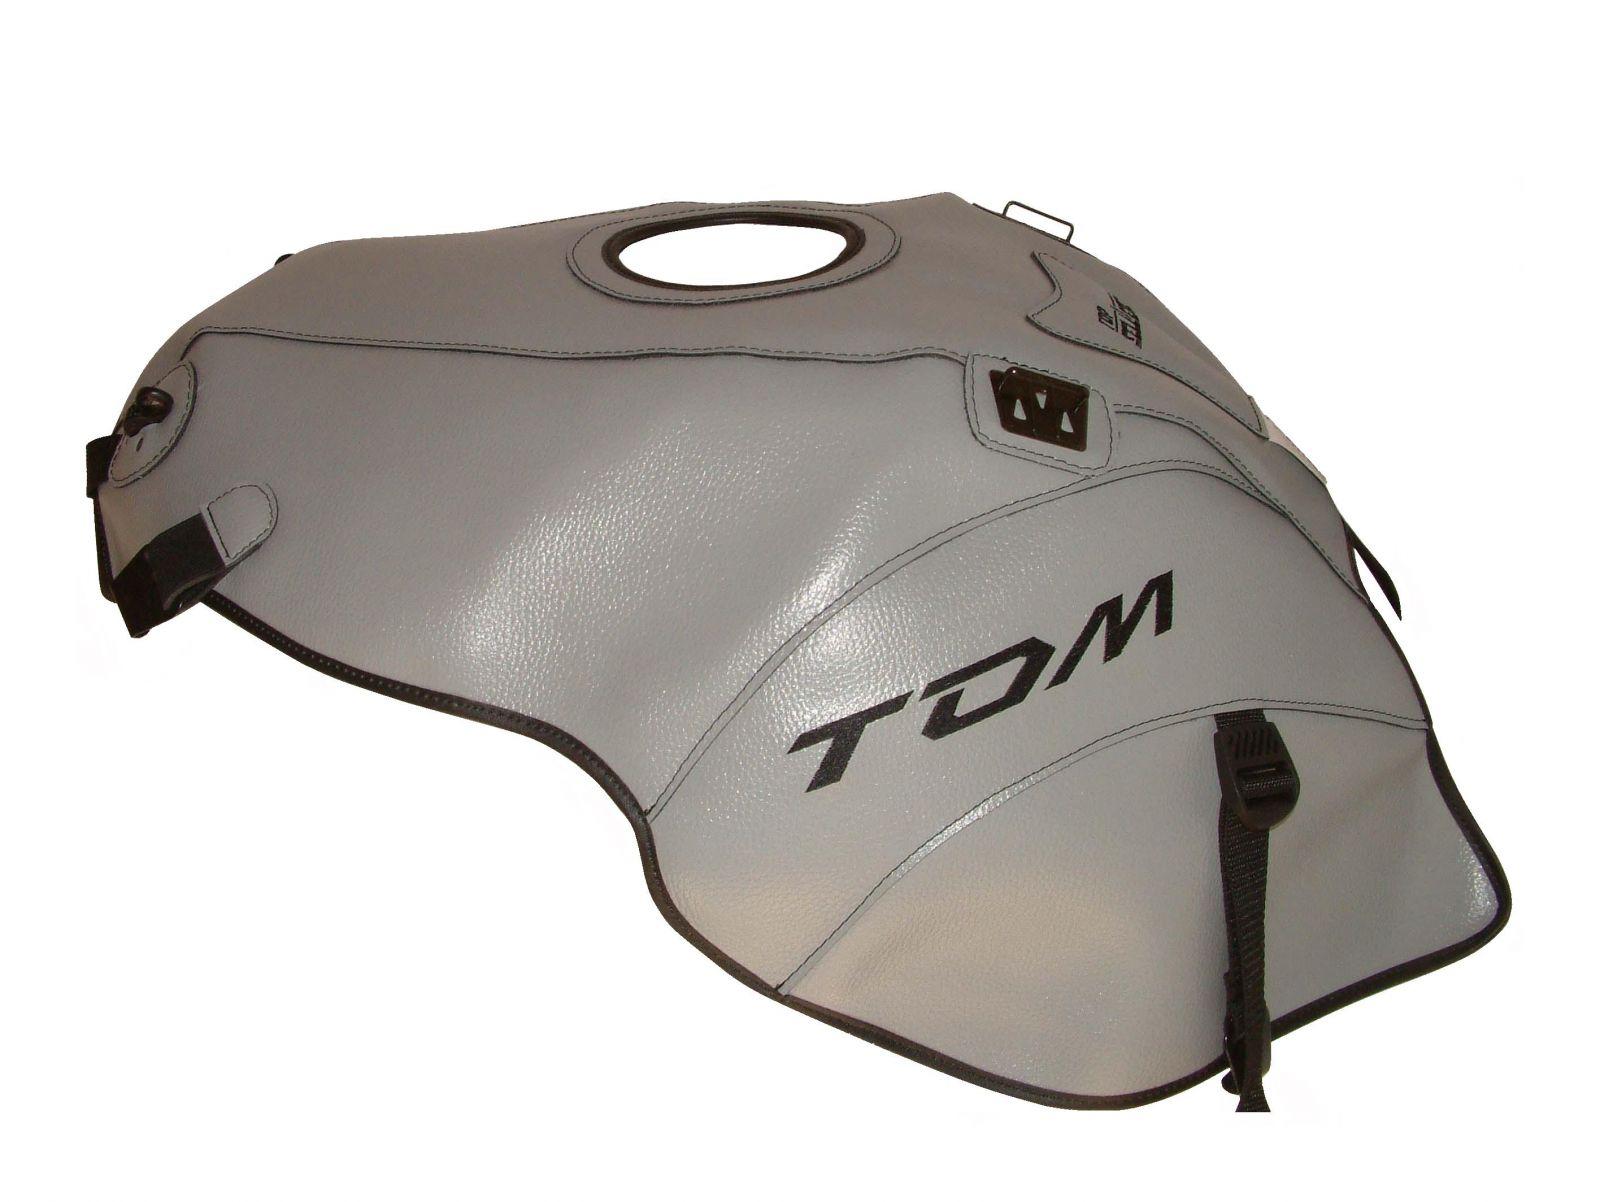 Capa de depósito TPR1988 - YAMAHA TDM 900 ABS